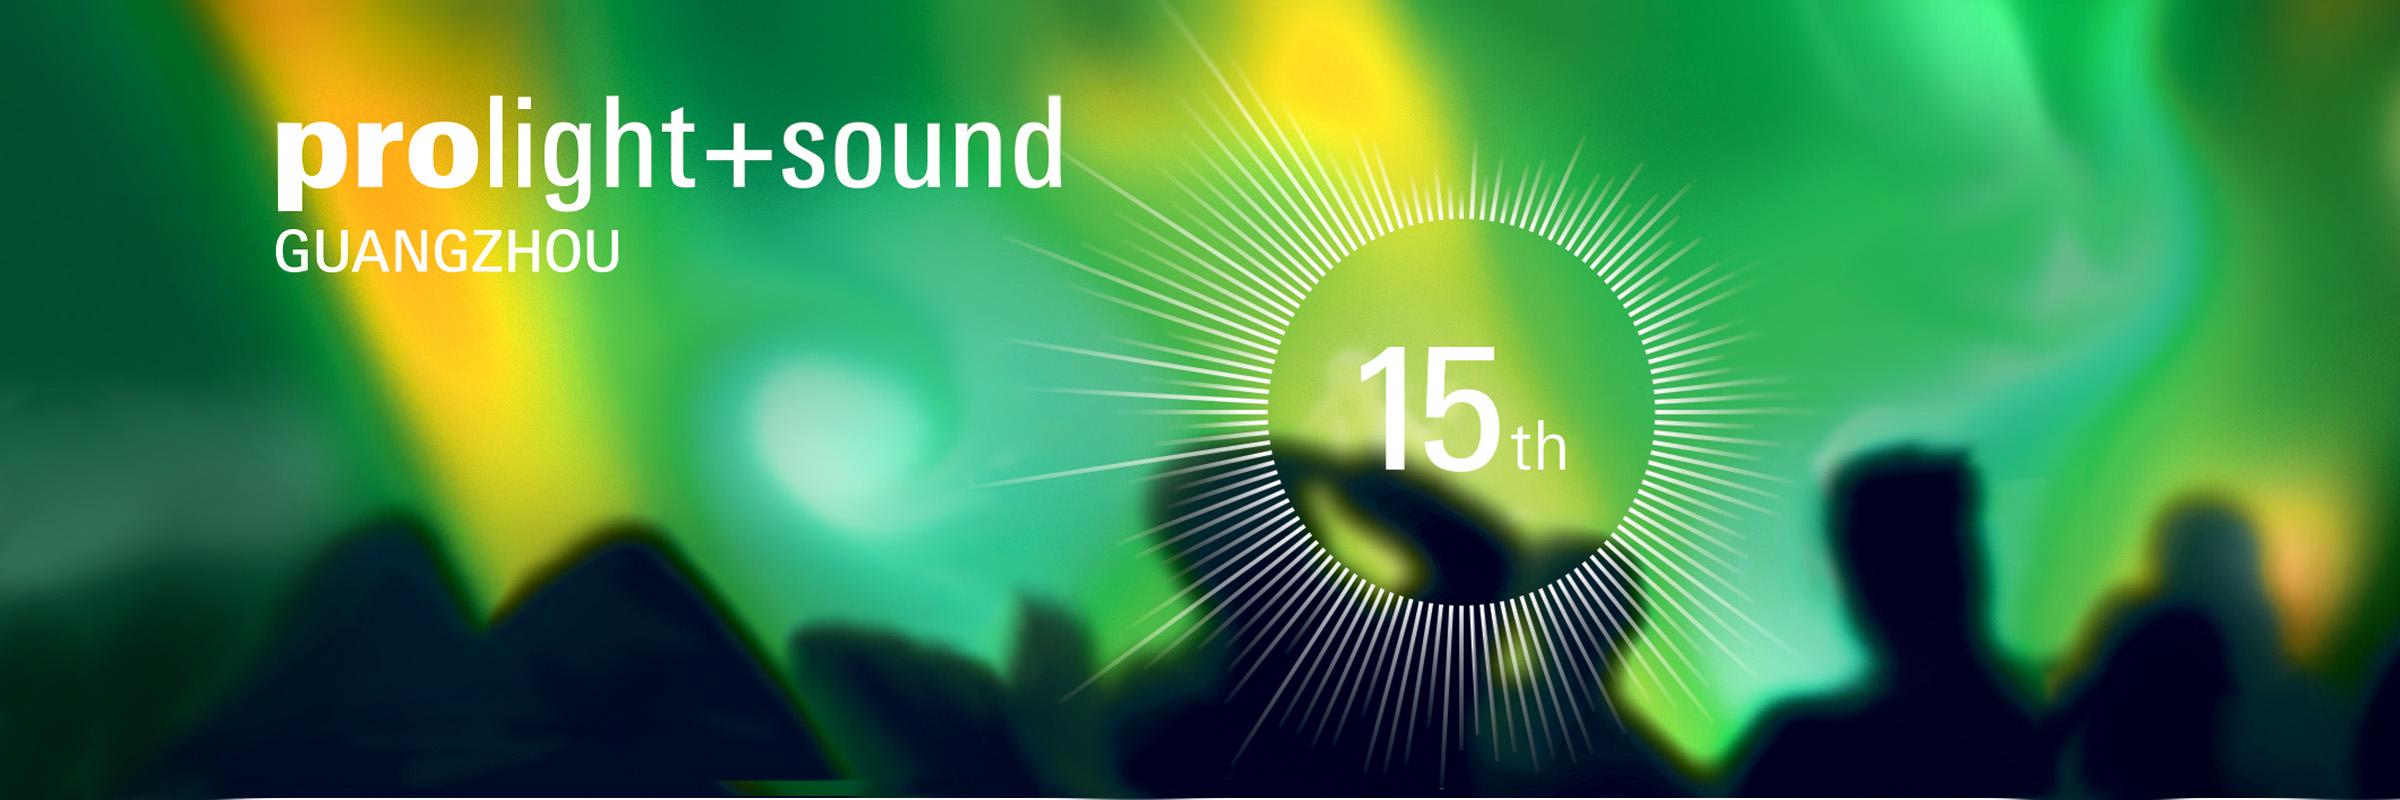 Antelope Audio presenting a new portable interface Zen Studio+ on Prolight + Sound Guangzhou